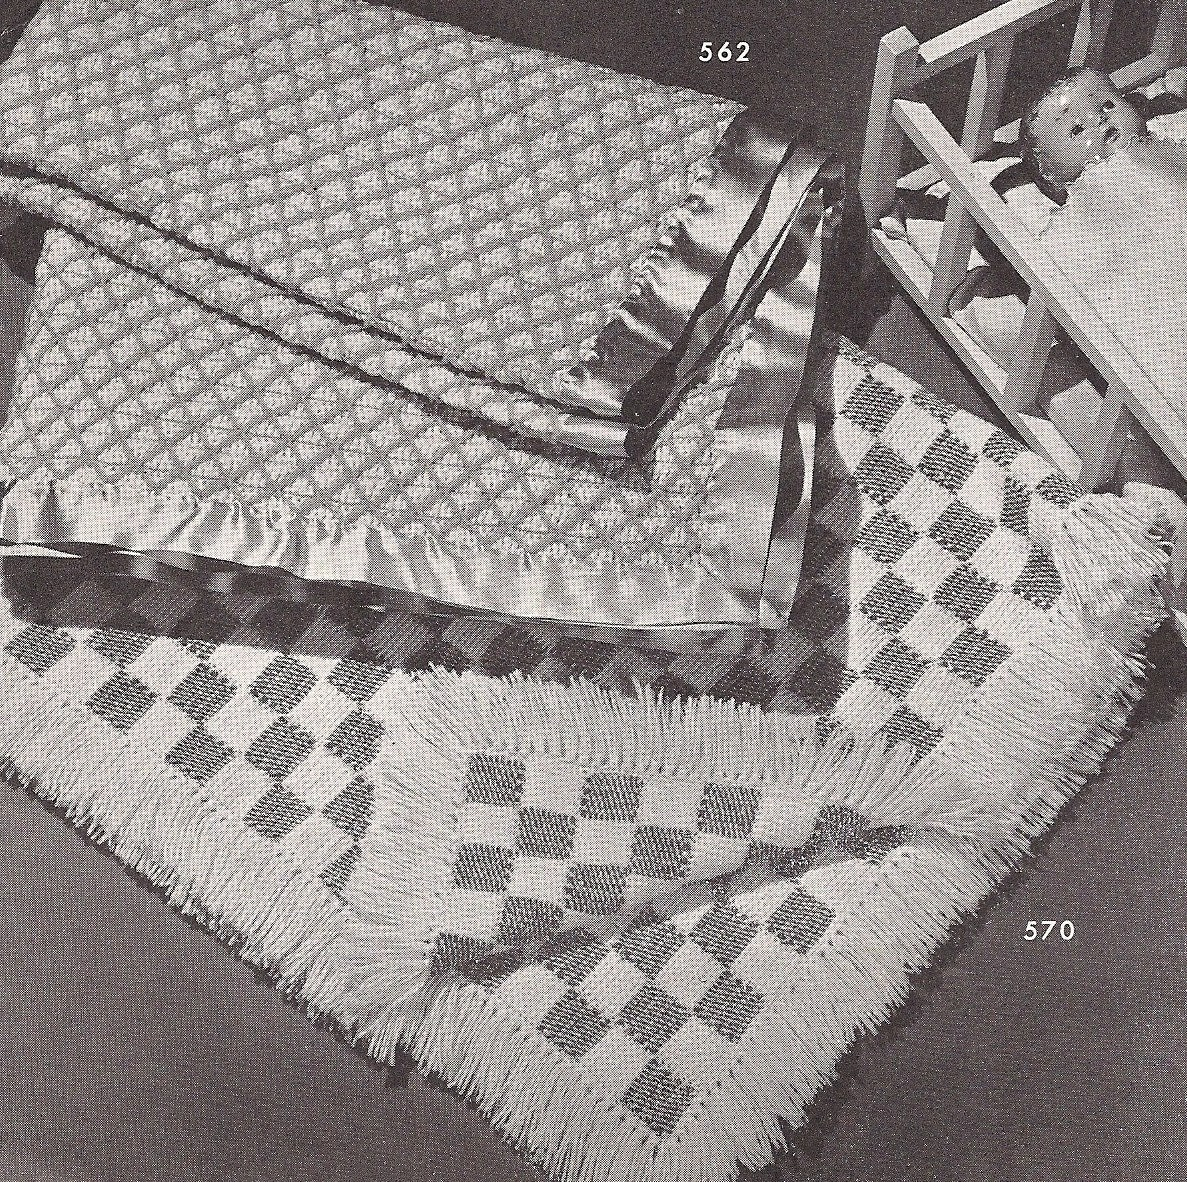 Vintage Crochet Patterns Baby Blankets : Vintage Patterns 2 Baby Blankets Crochet pdf pattern